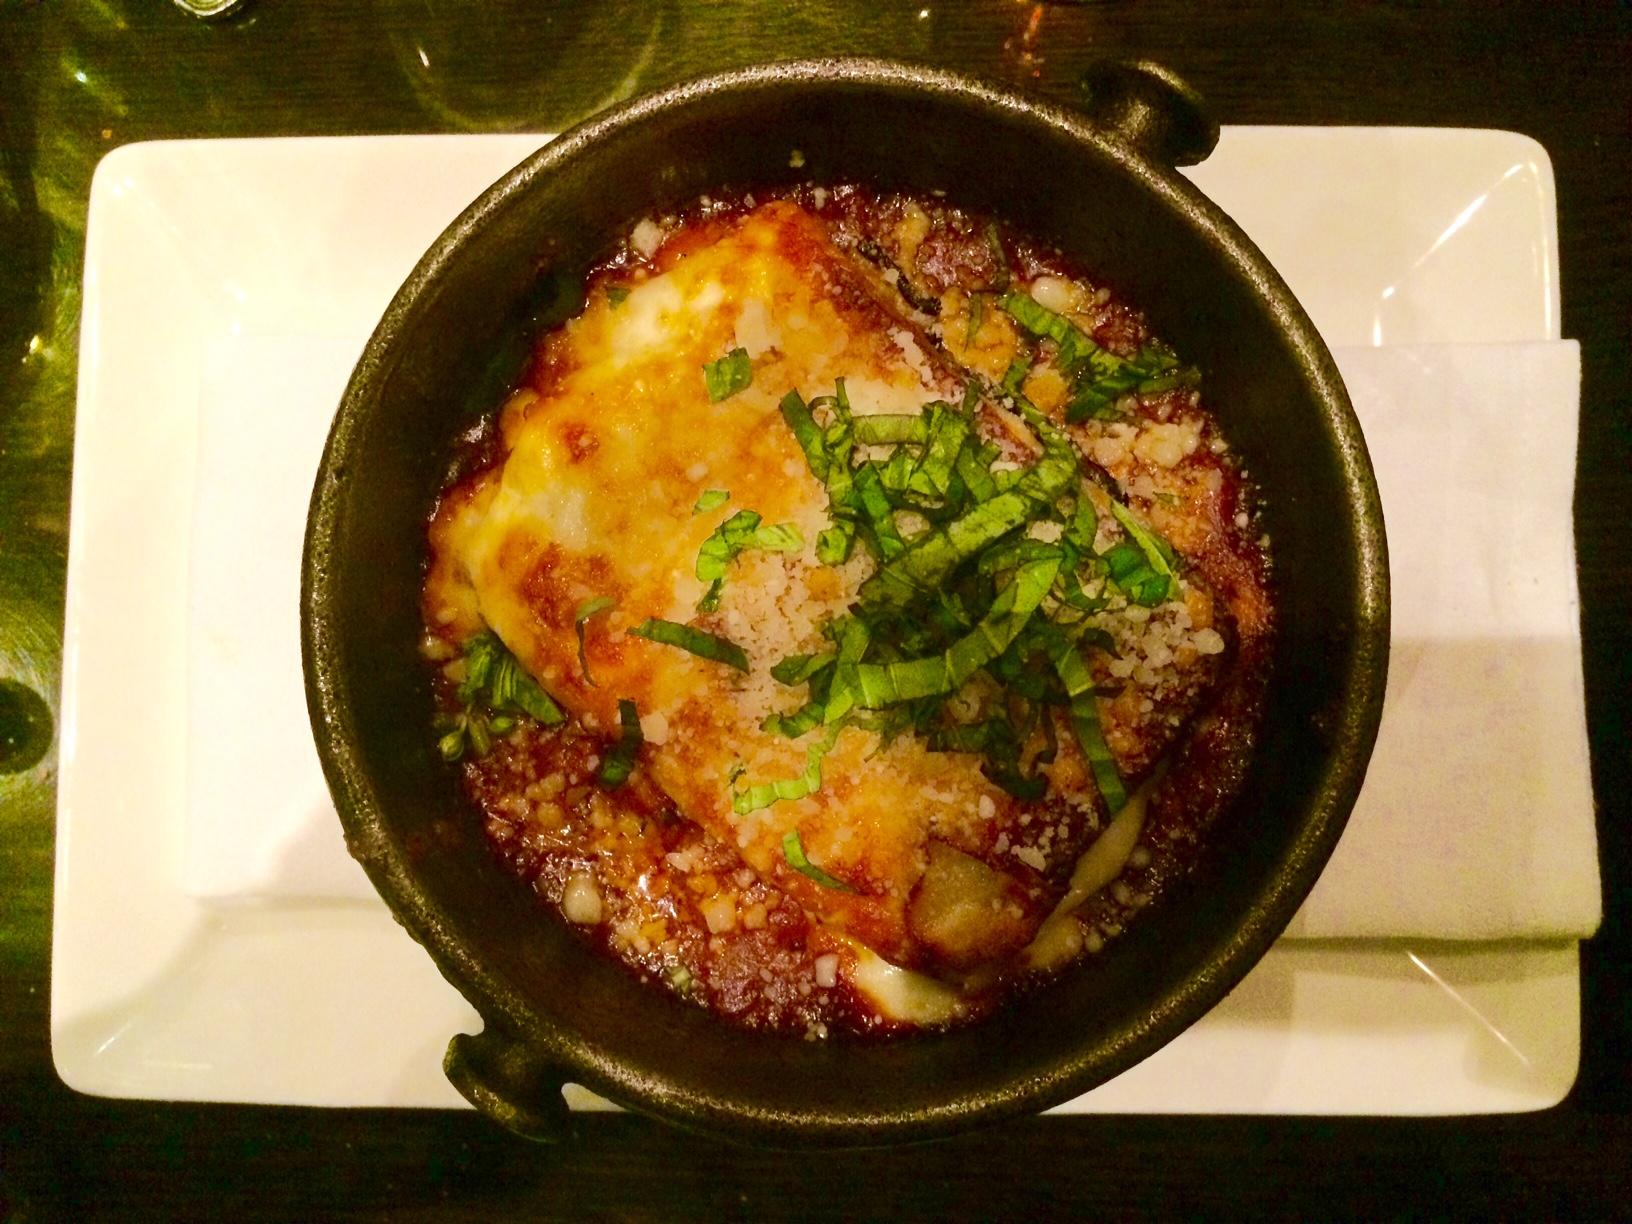 wild-mushroom-and-spinach-lasagna-at-the-local-restaurant-jackson-hole ...